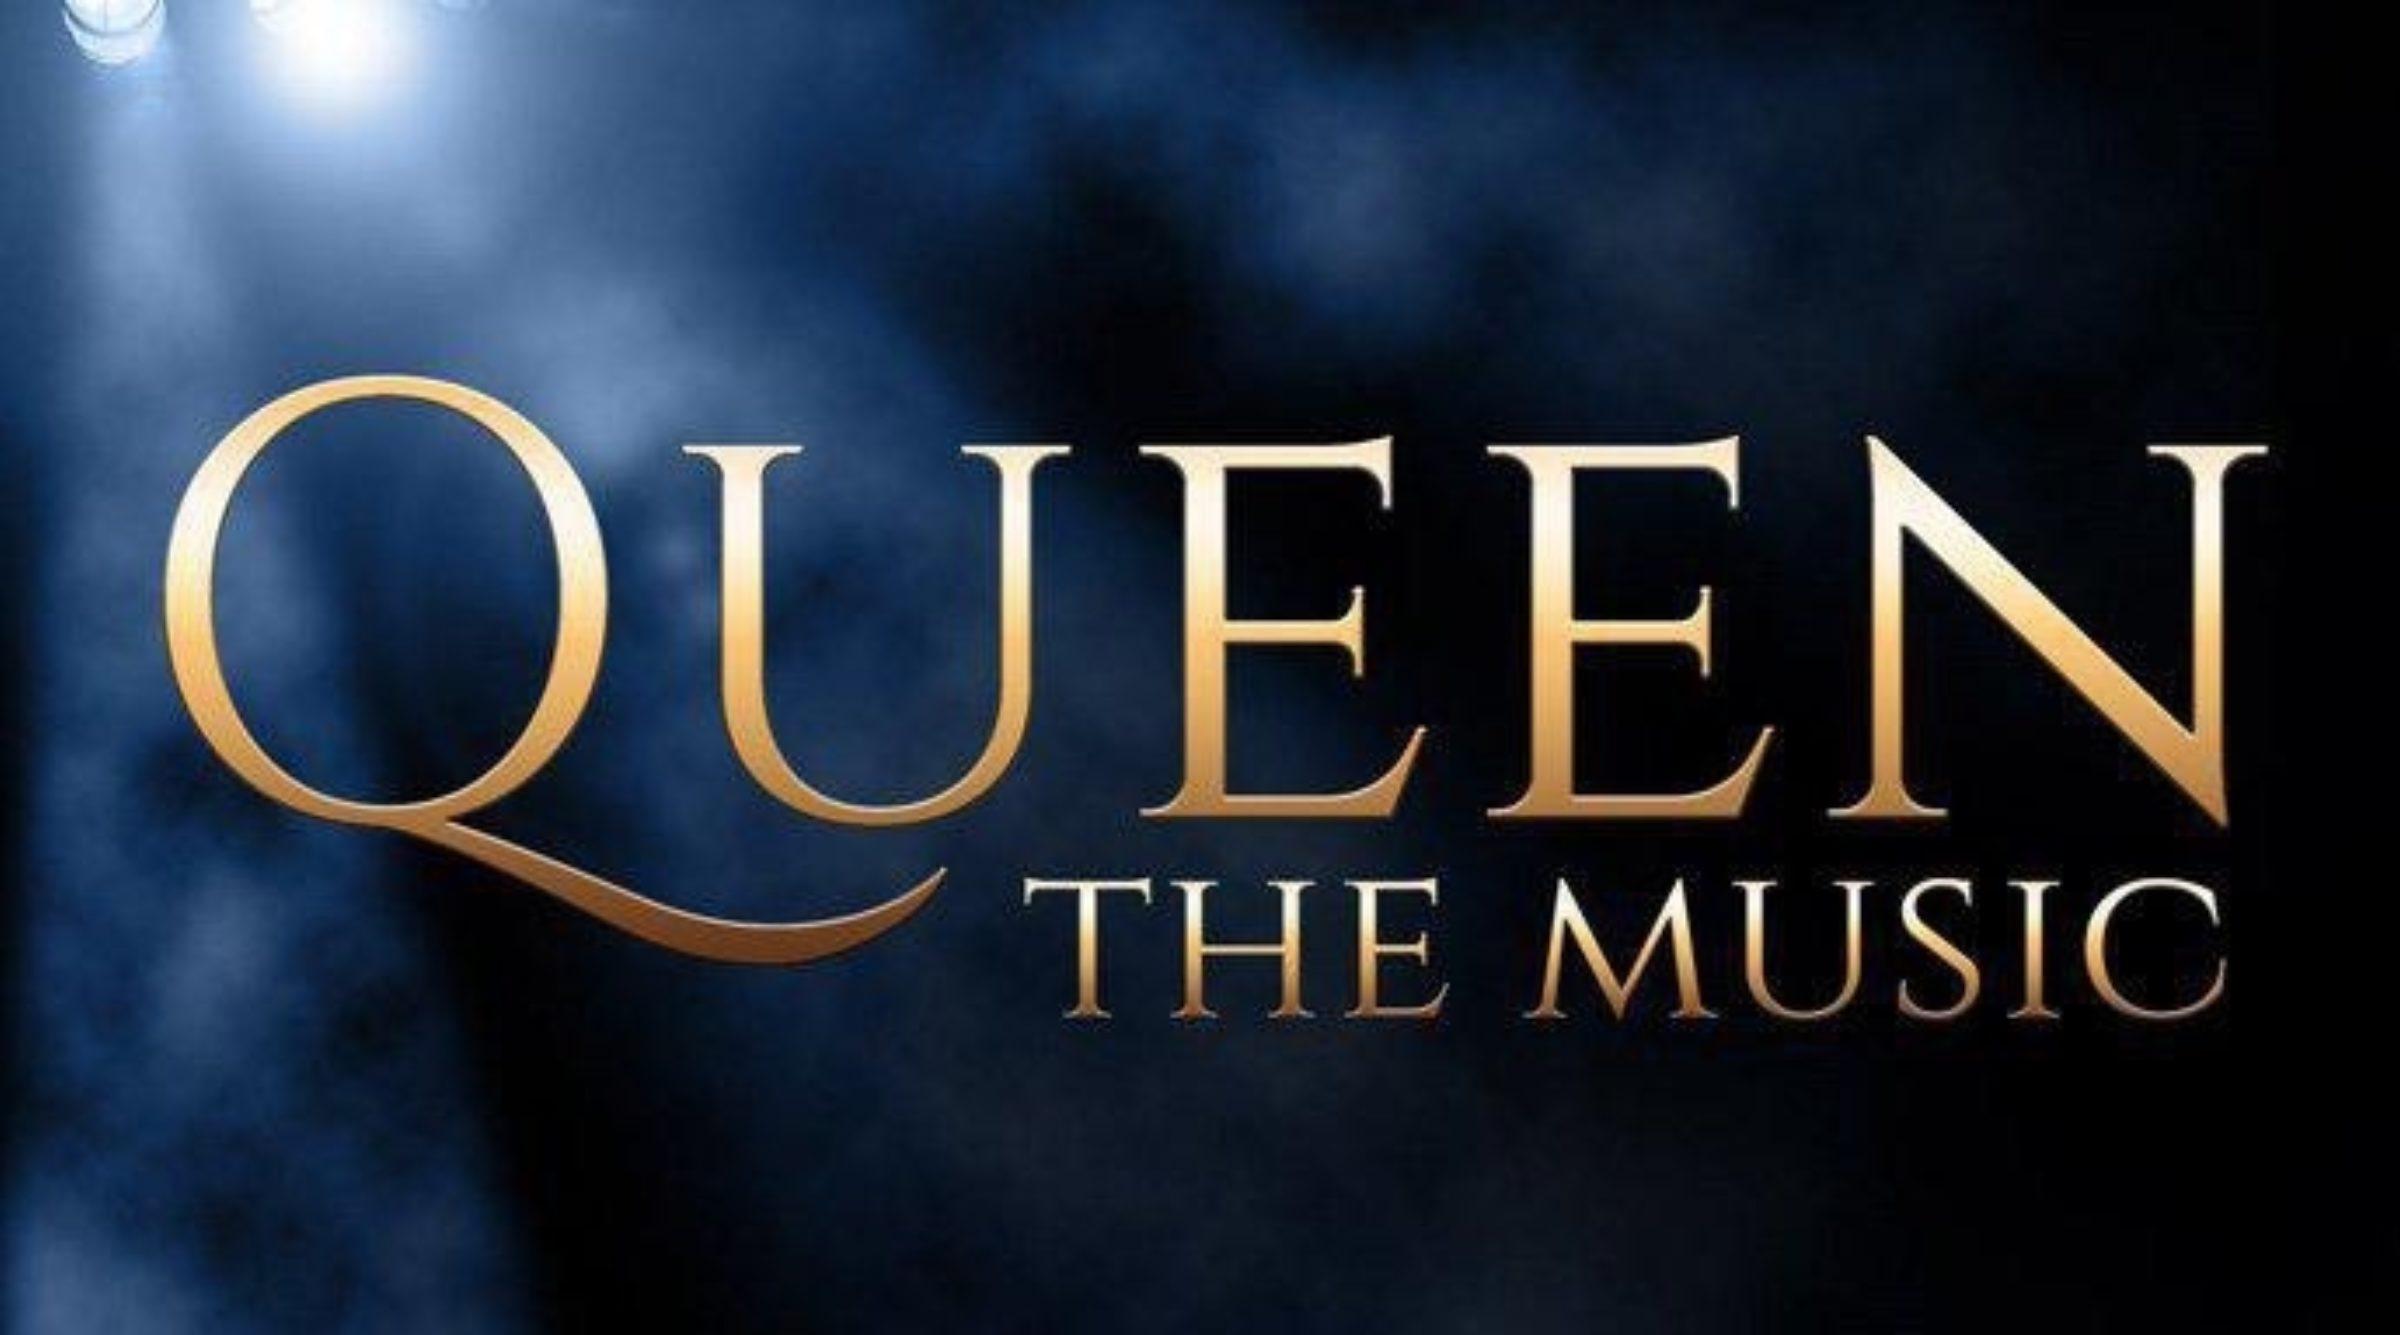 Queenthemusic 2114 1550069779 35hxcpuh44